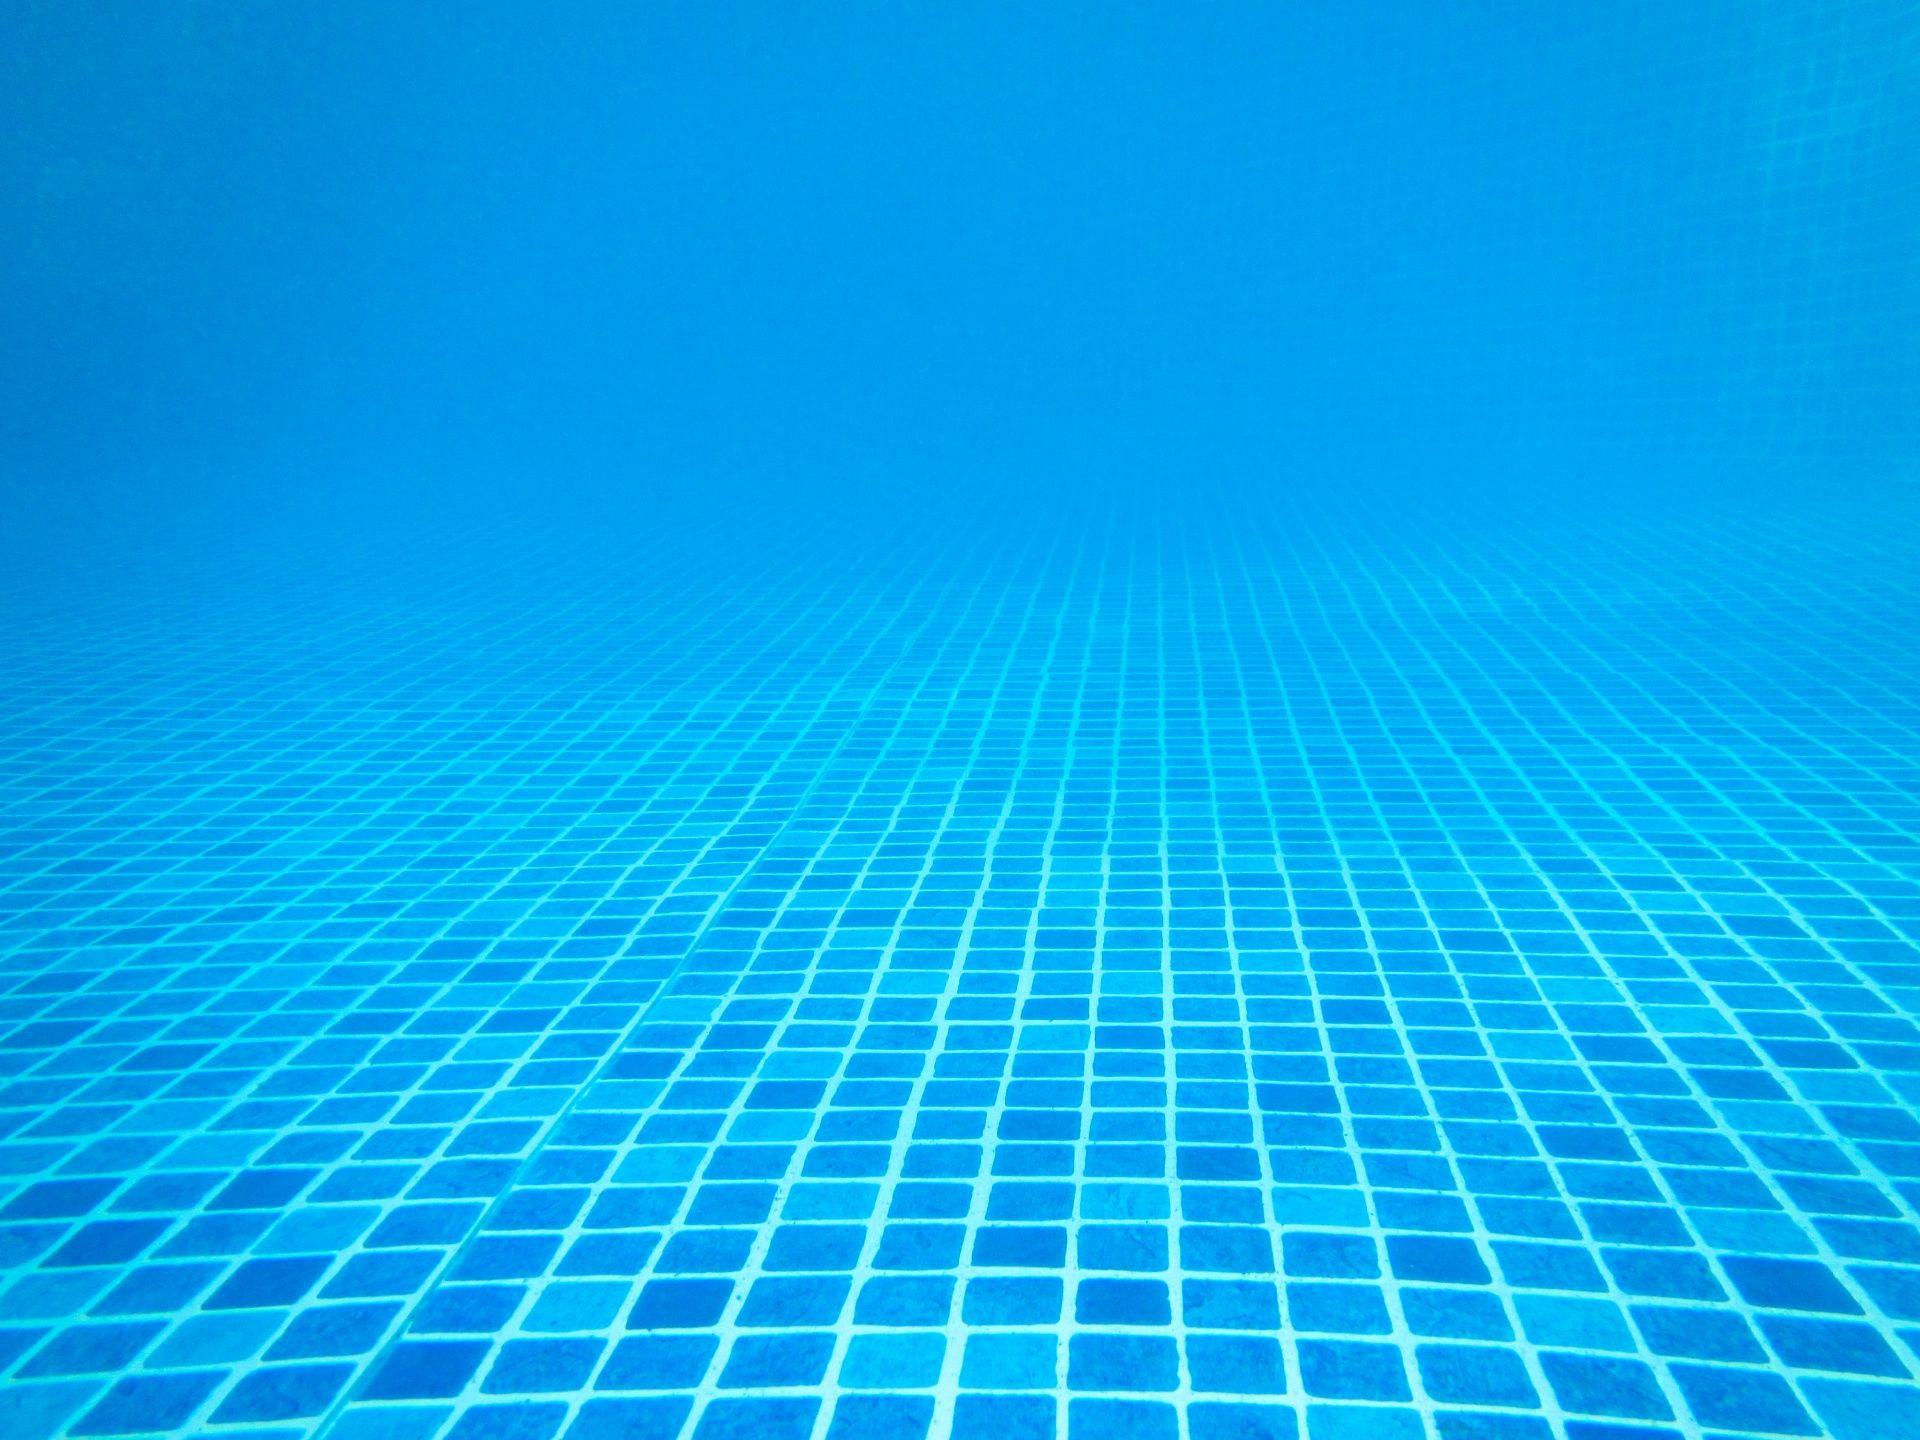 underwater pool wallpaper free high definition download